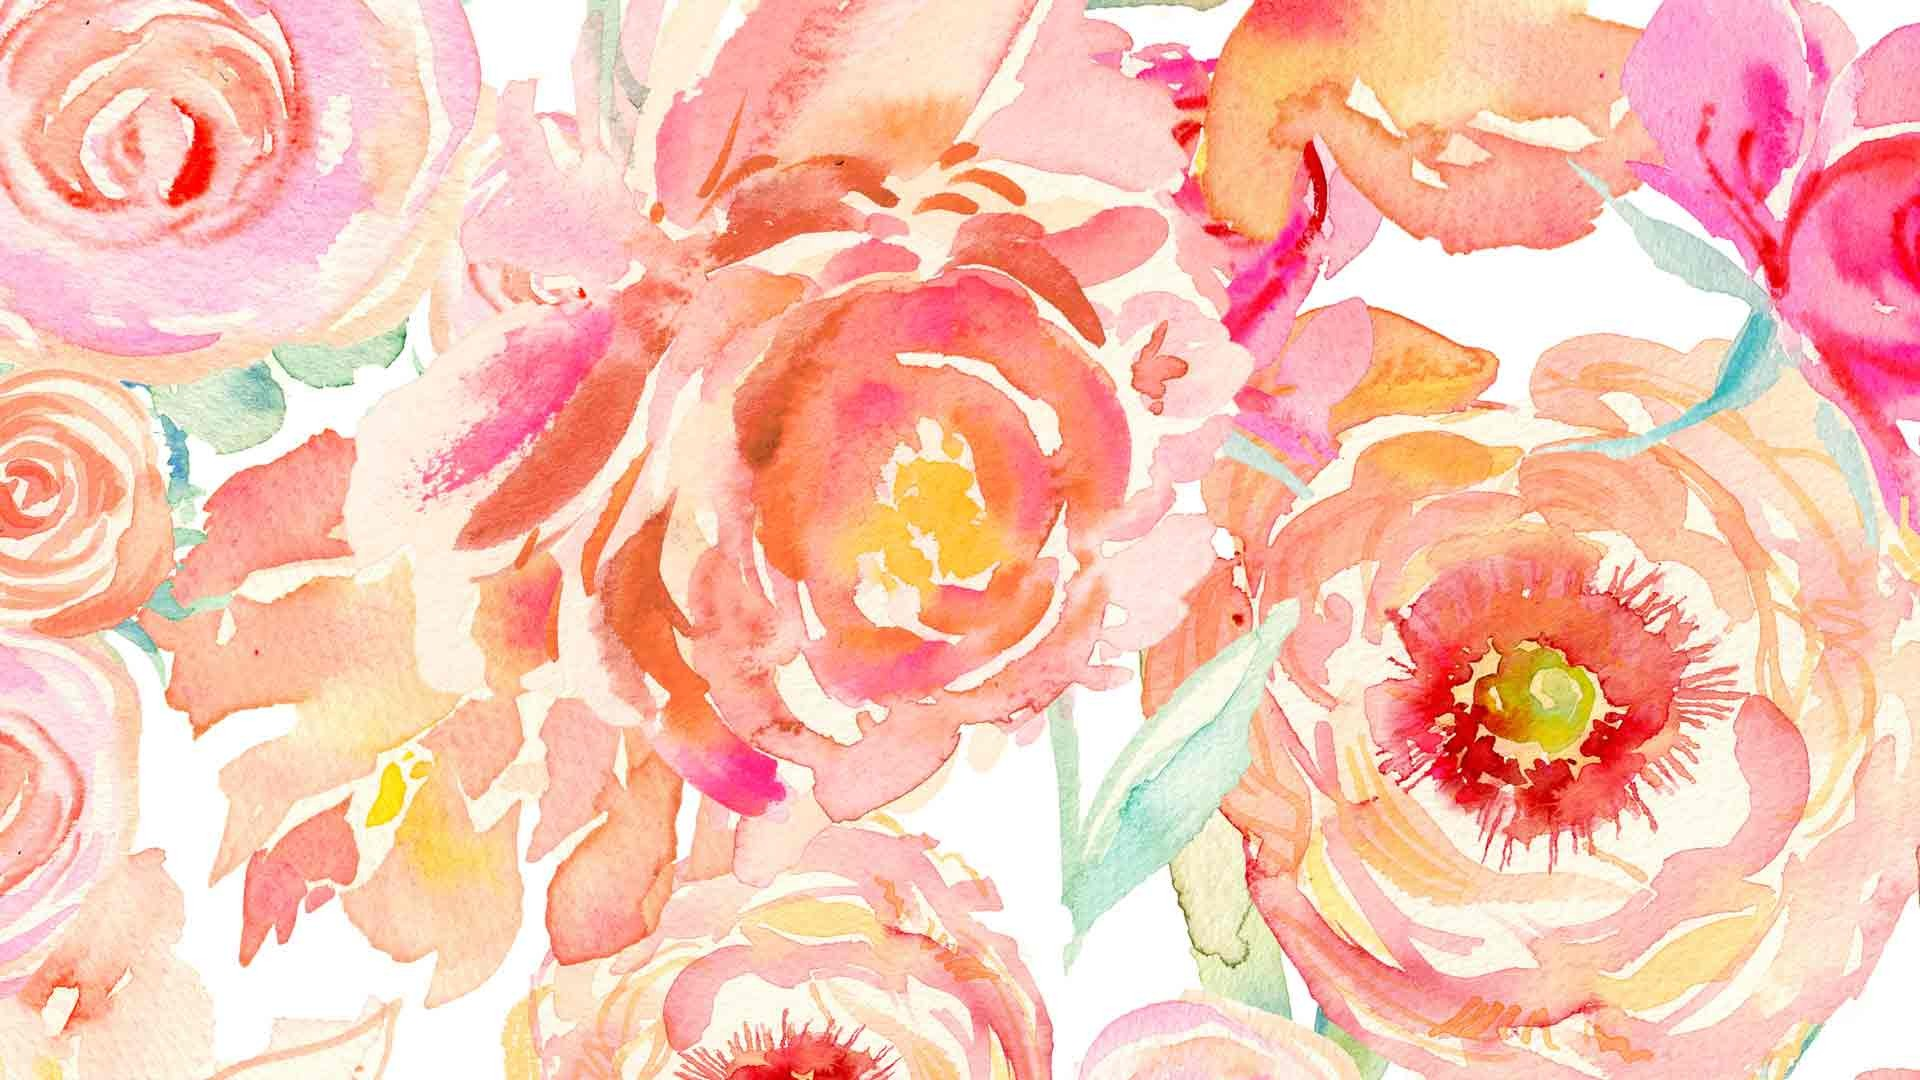 watercolor background tumblr 183�� download free beautiful